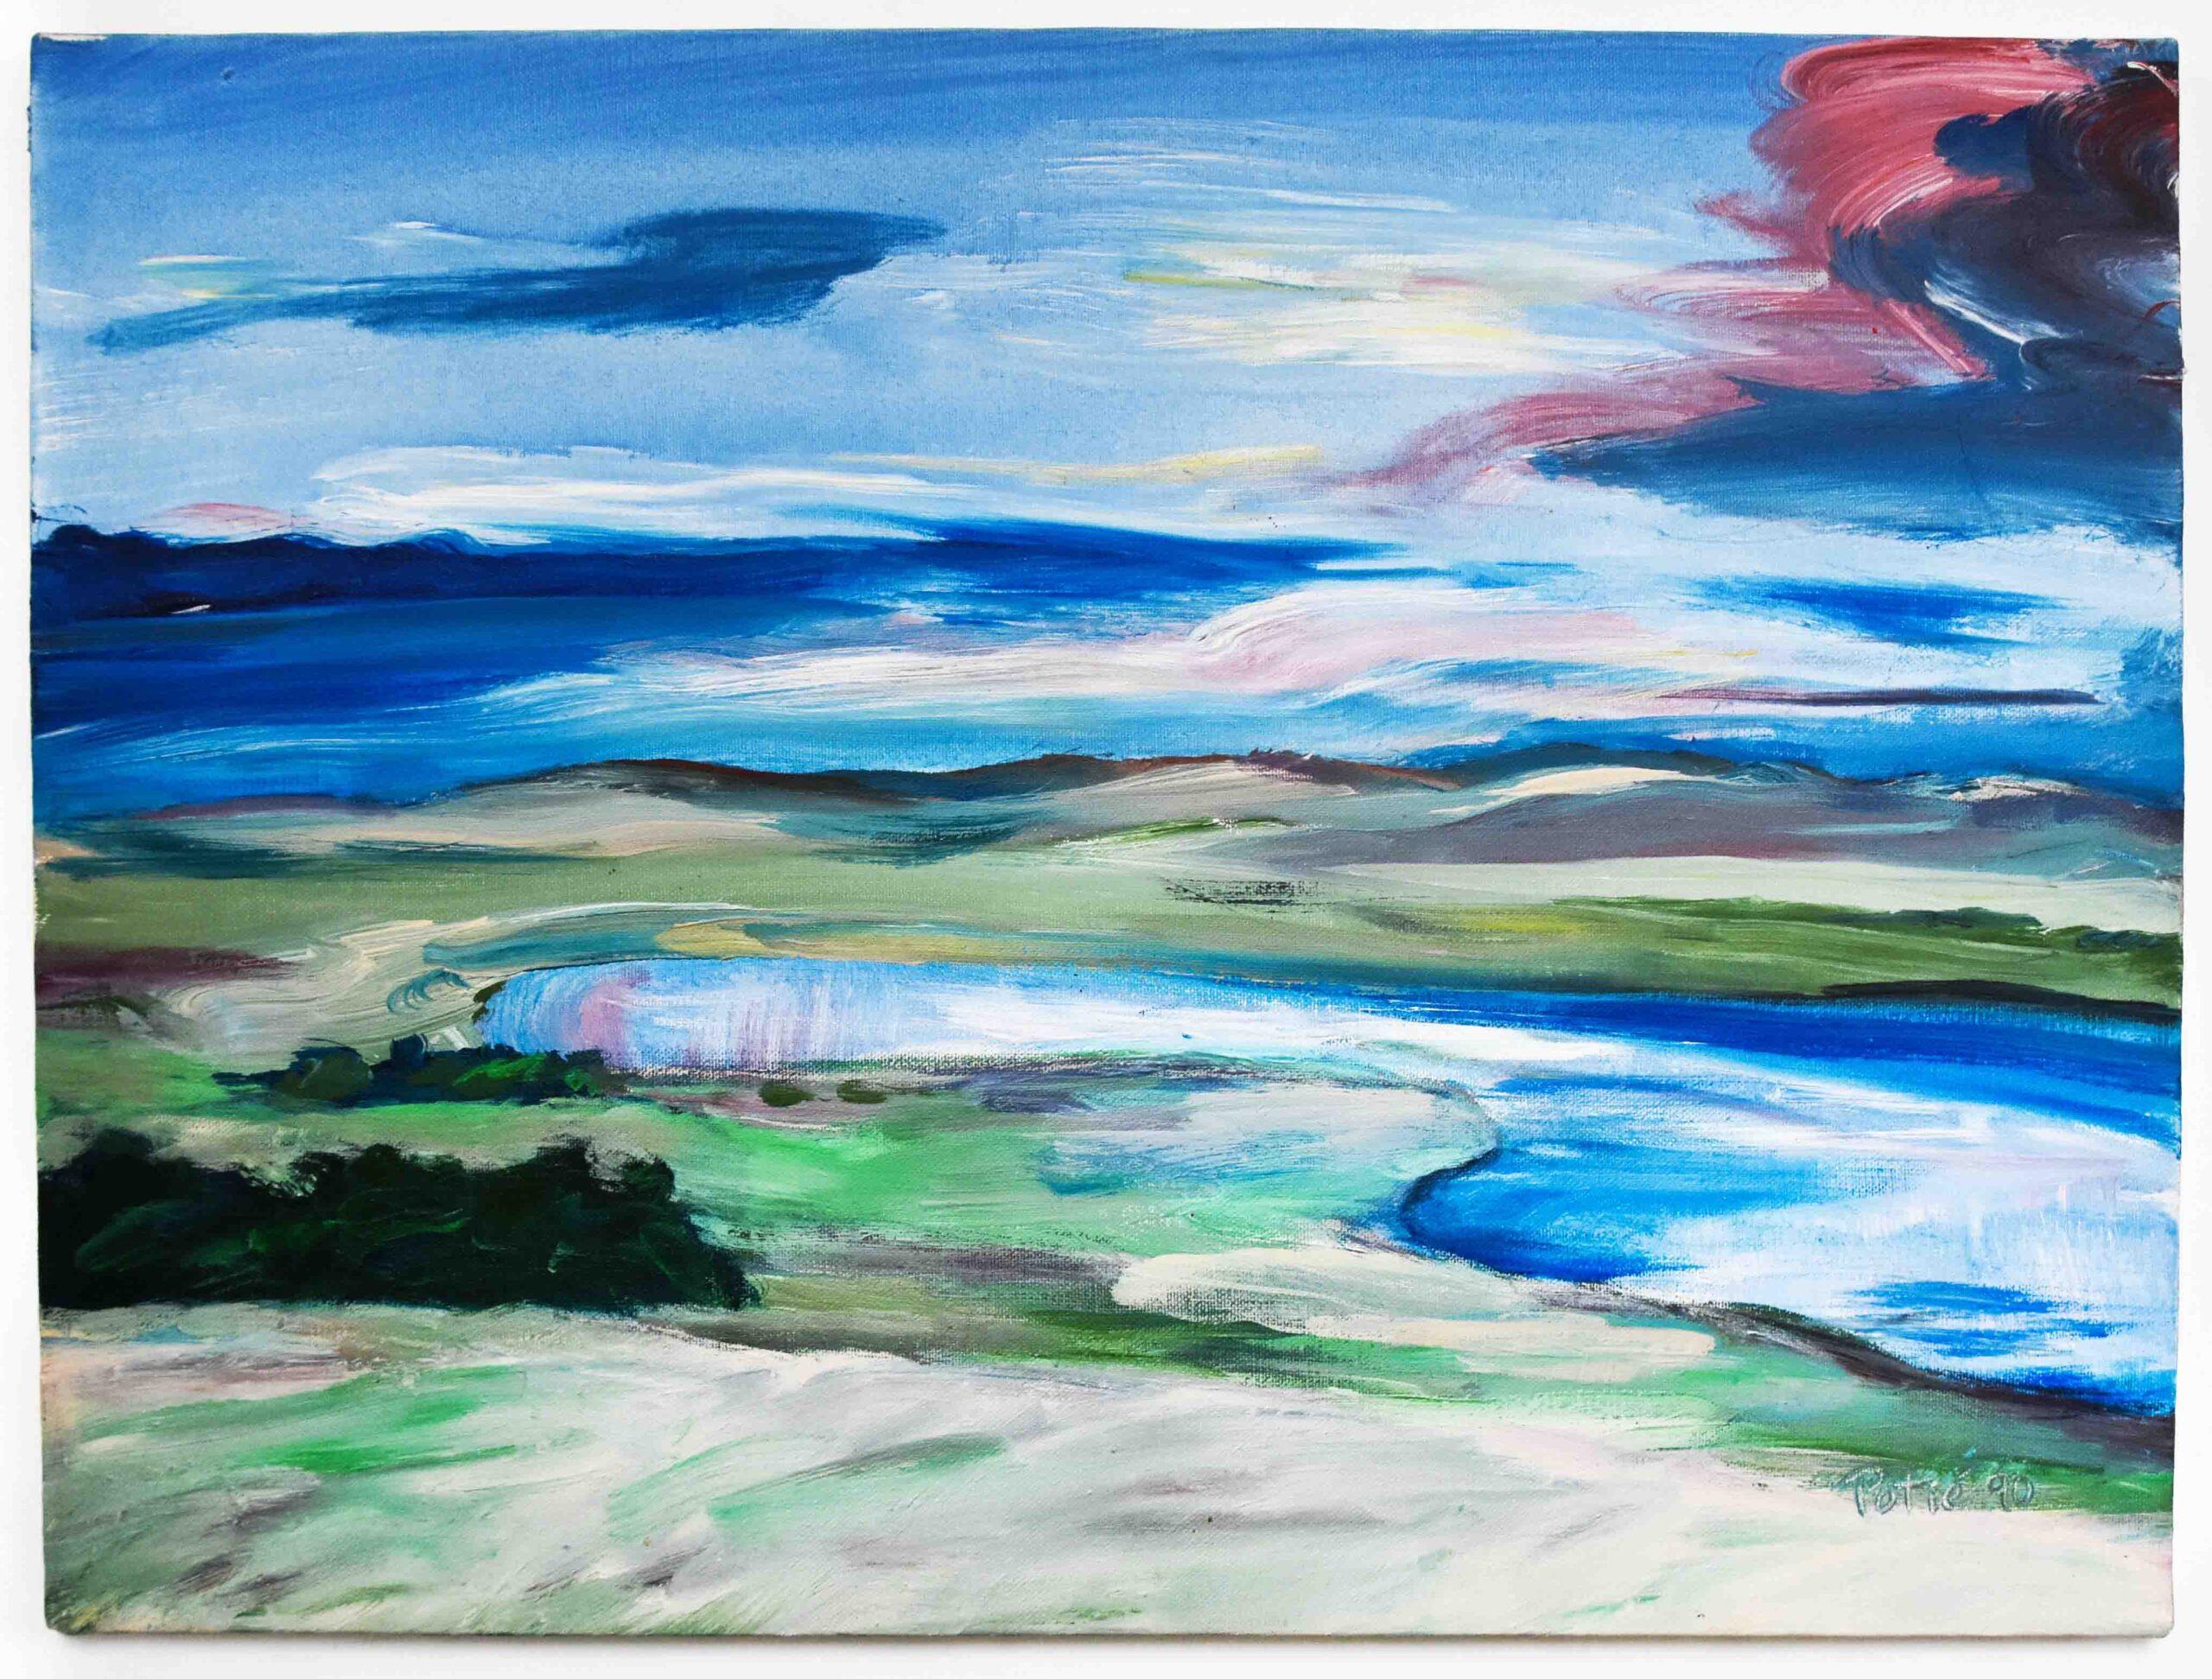 1990 antelope lake acrylic on canvas 15x18 by Raymond Potié